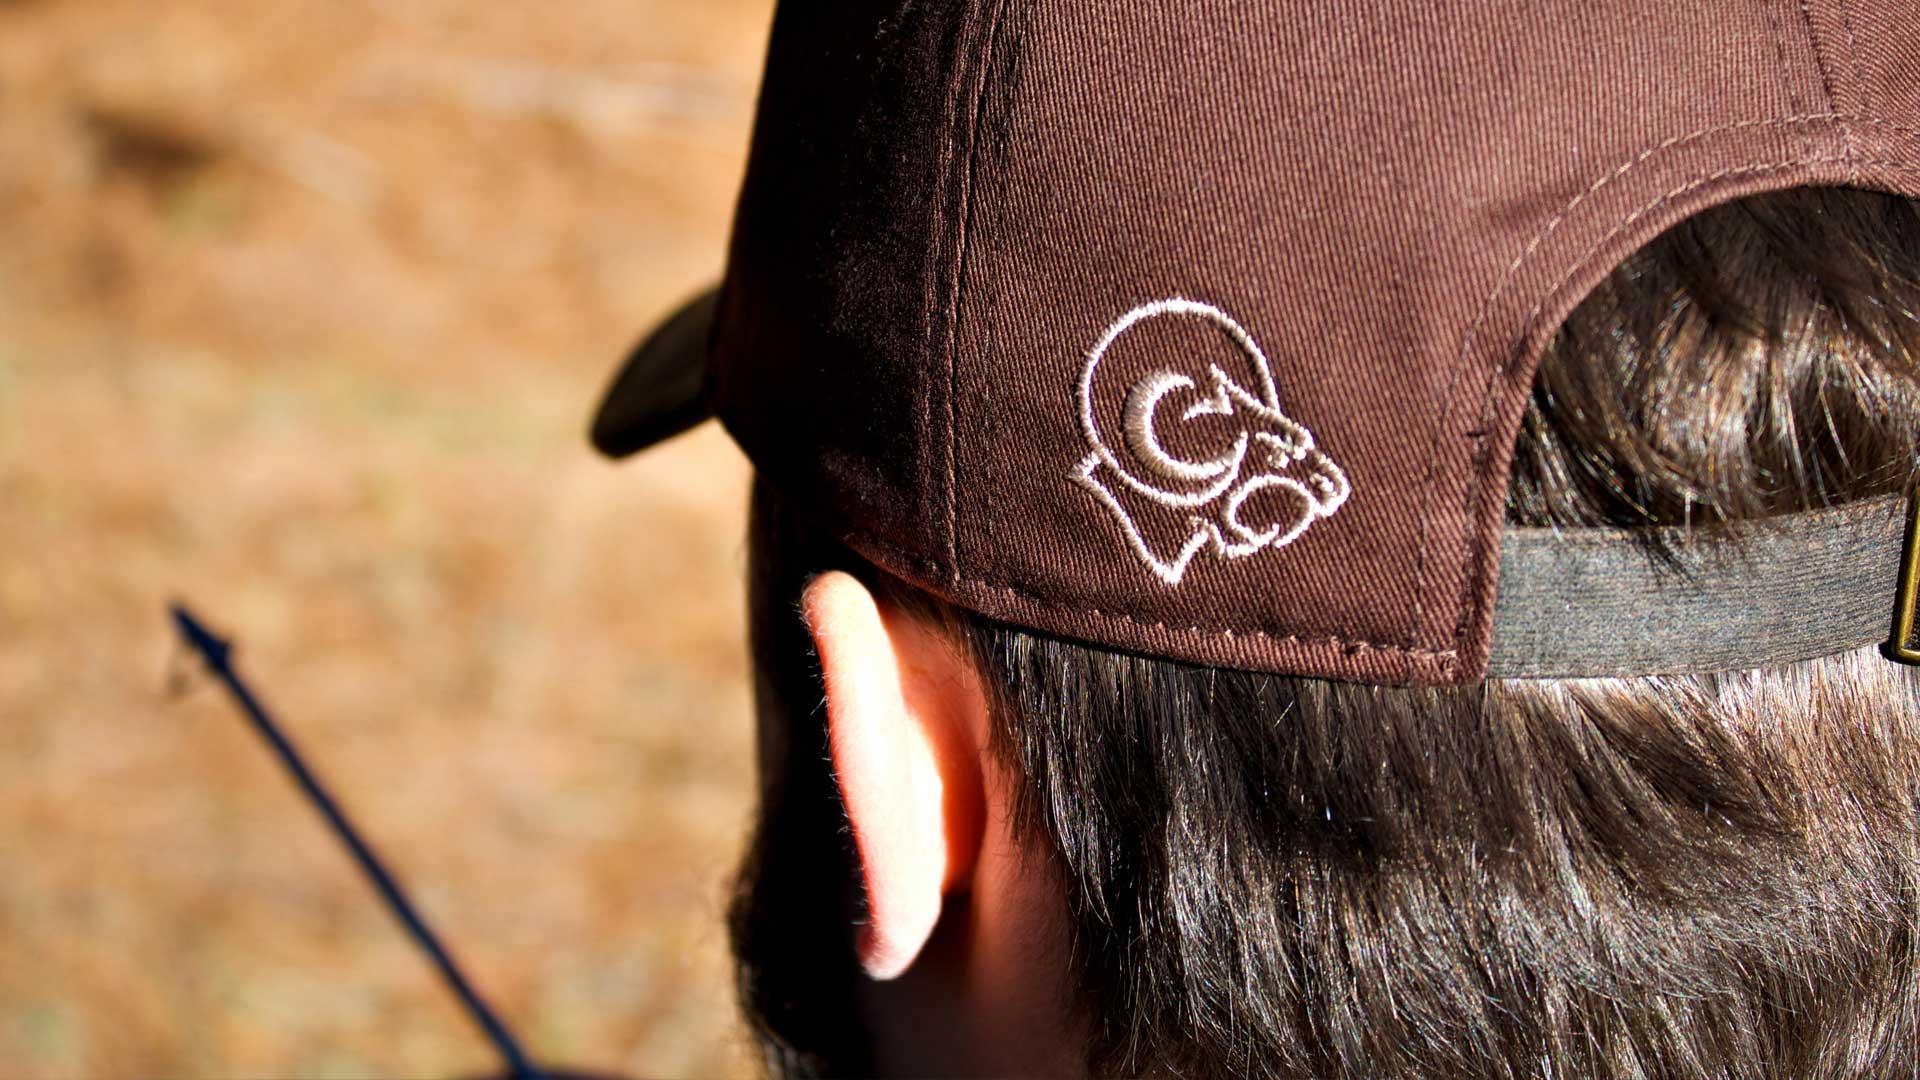 Get Gear Here - Apparel & Hats